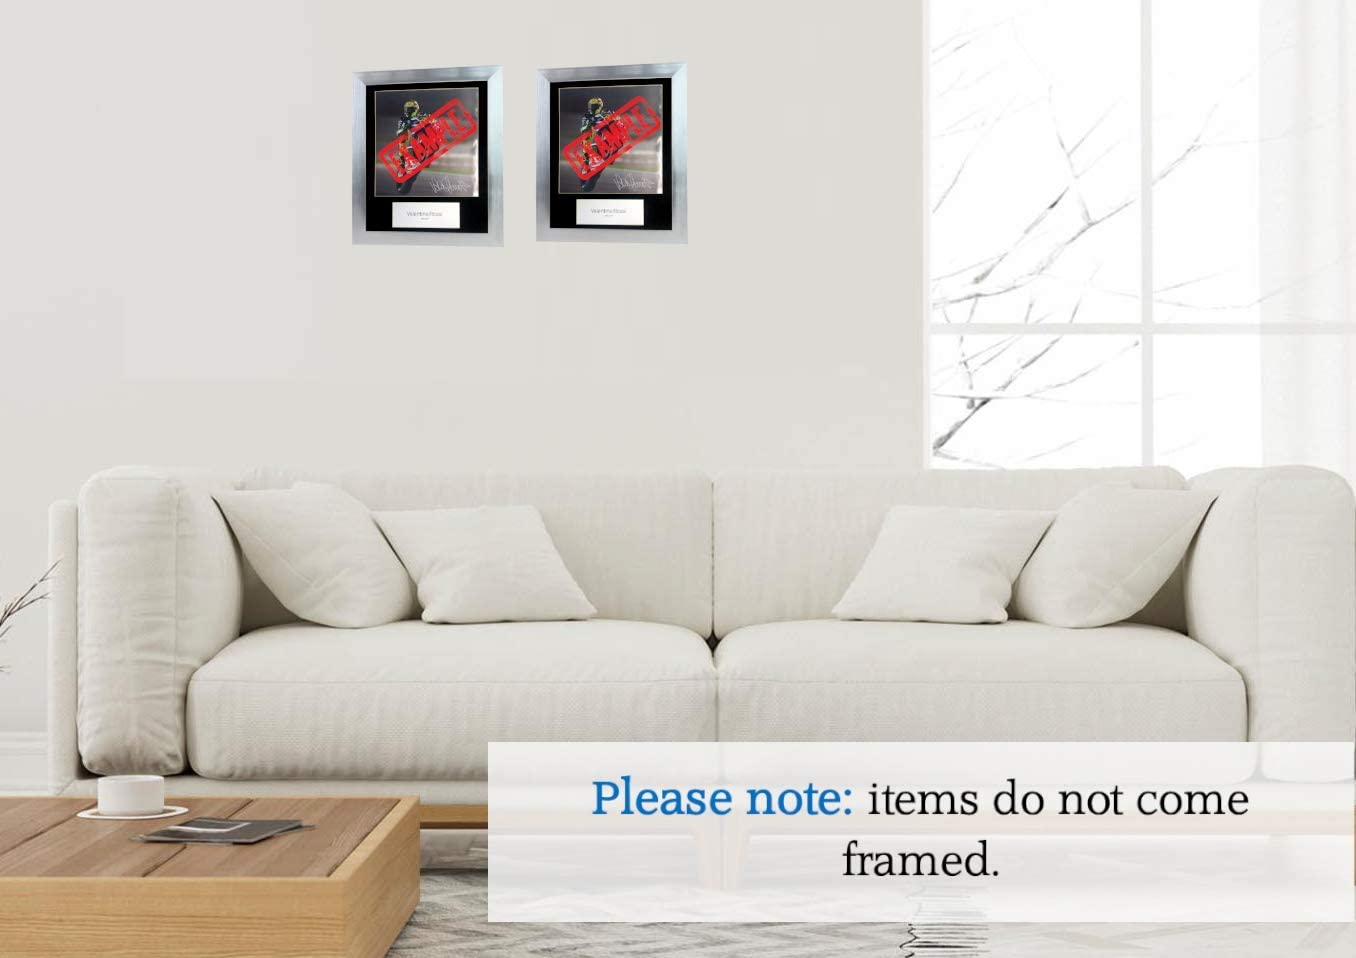 Frame Smart Mumford /& Sons #1 Fotoanzeige Signierter Fotodruck 10x8 Gr/ö/ße passt 10x8 Zoll Rahmen Maschinenschnitt Geschenk Sammlerst/ück